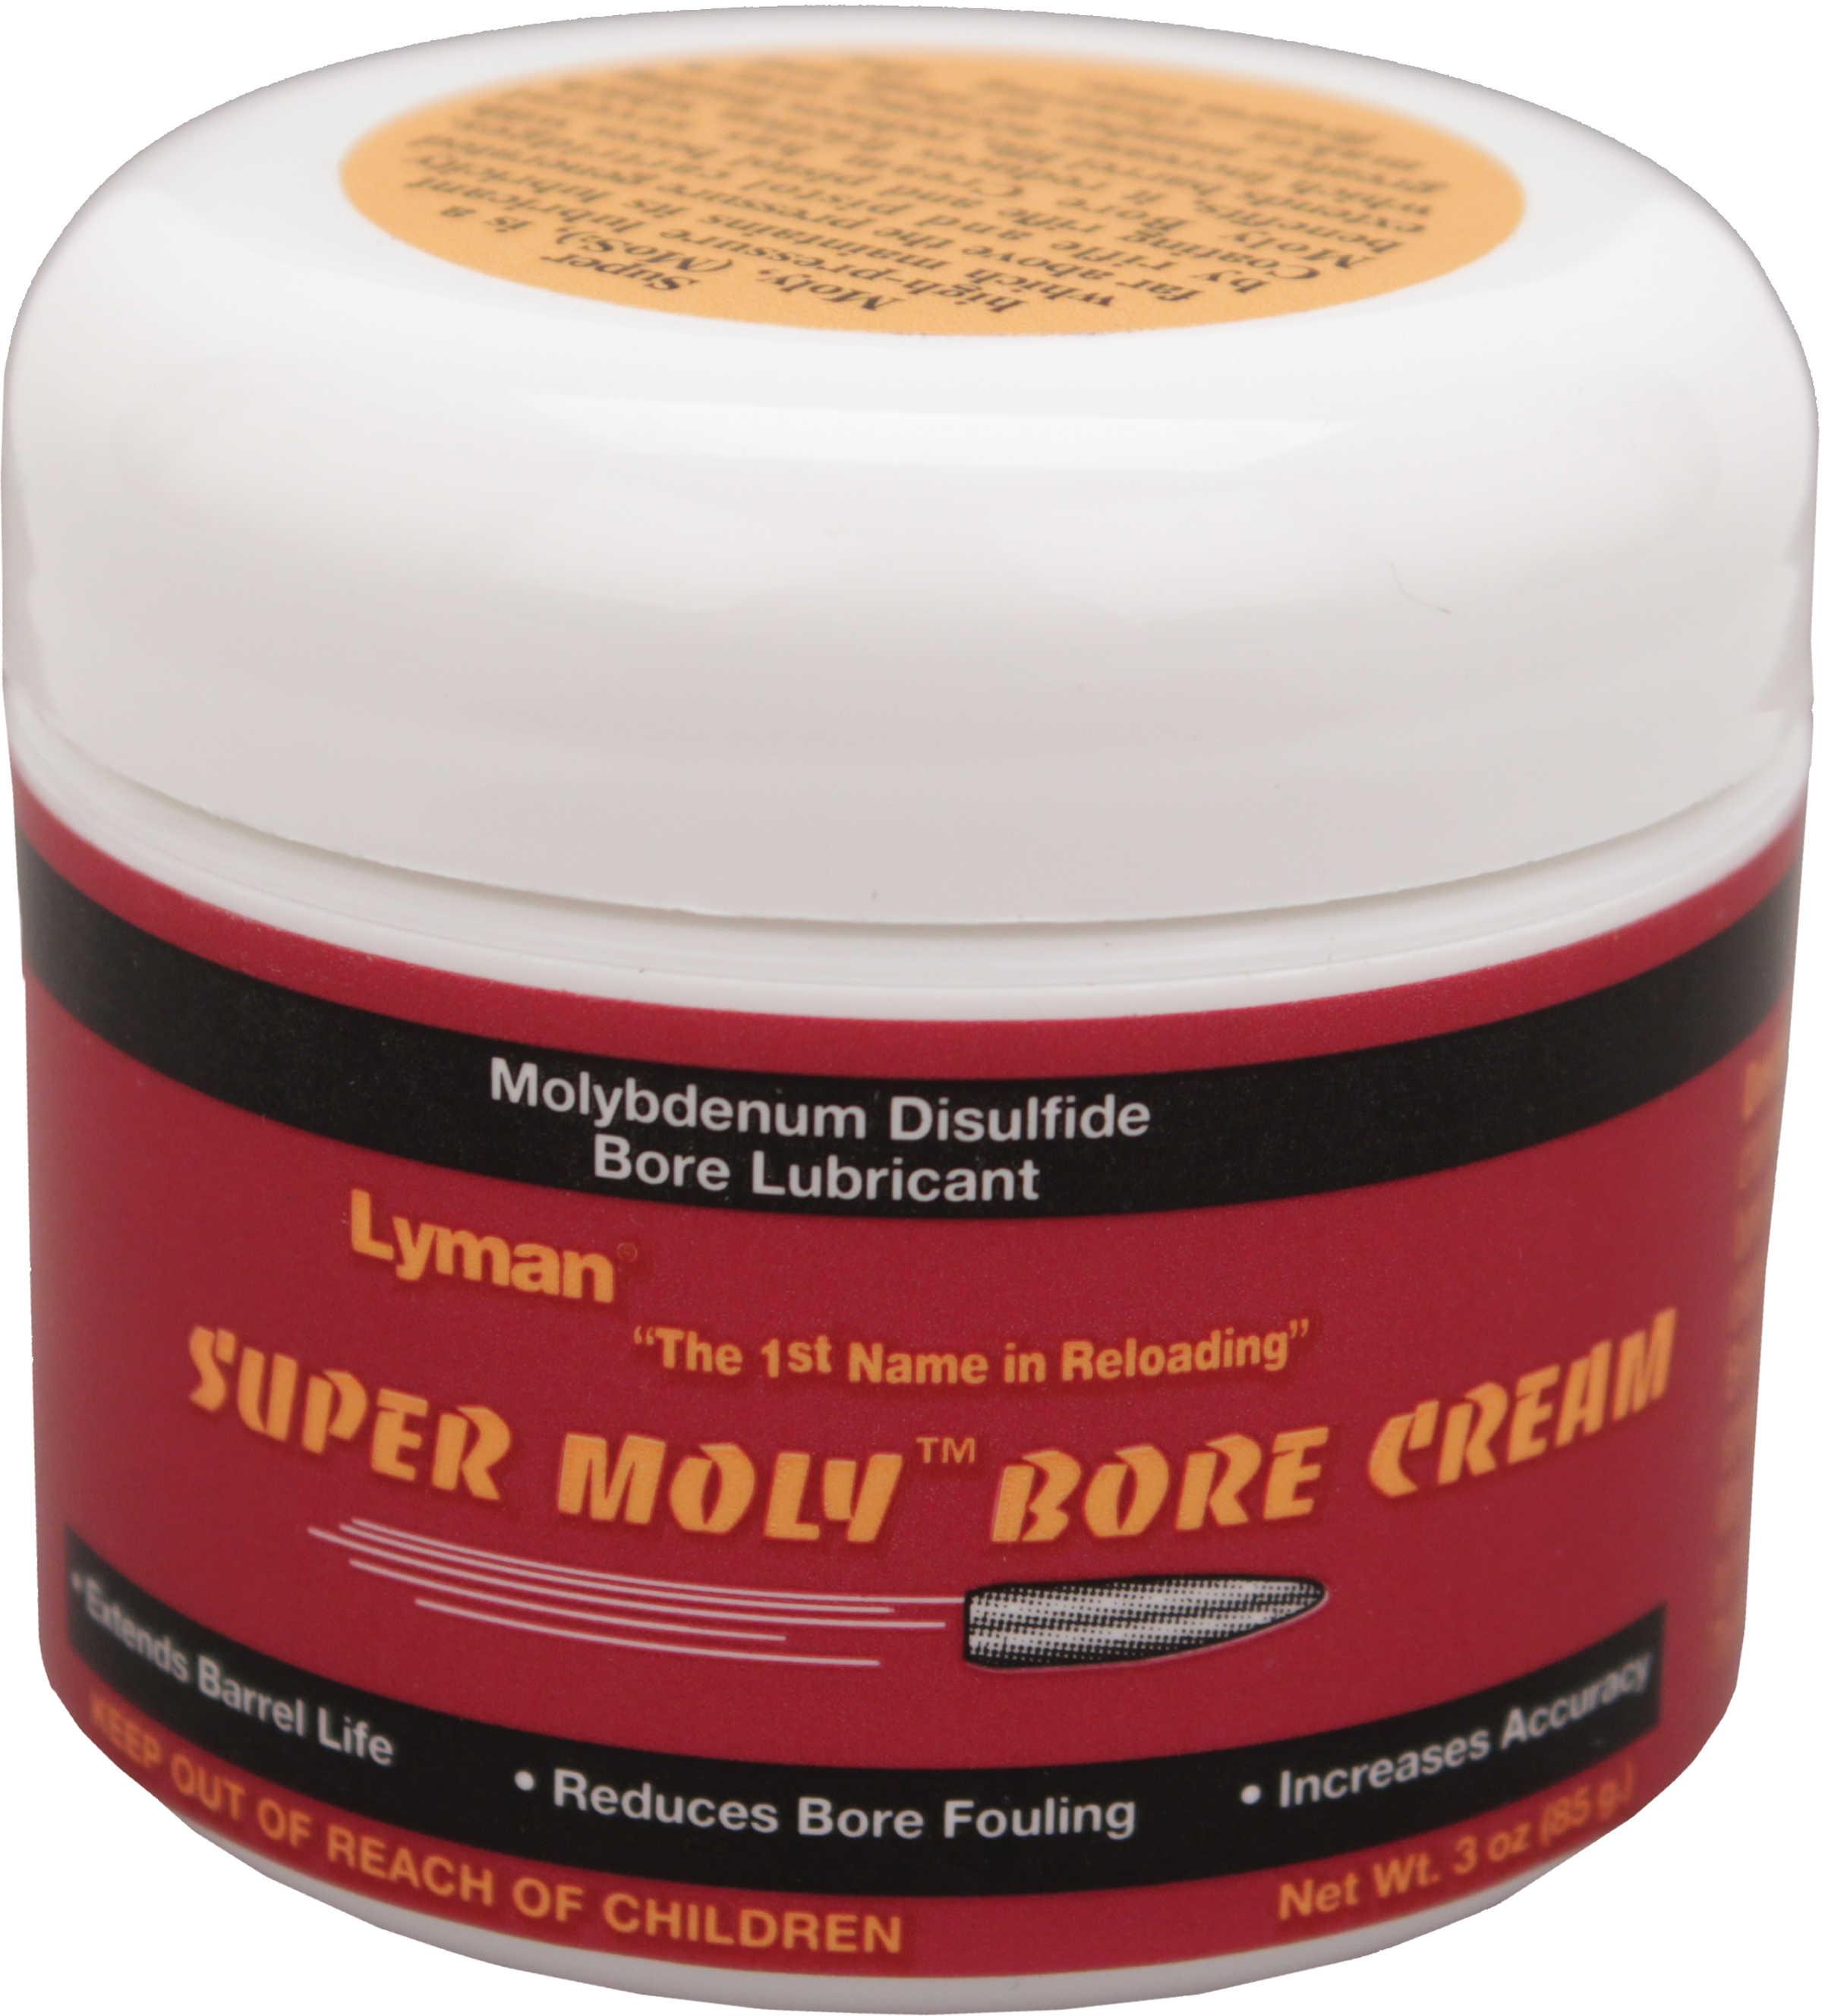 Lyman Moly Bore Cream (3 oz.) 7631419